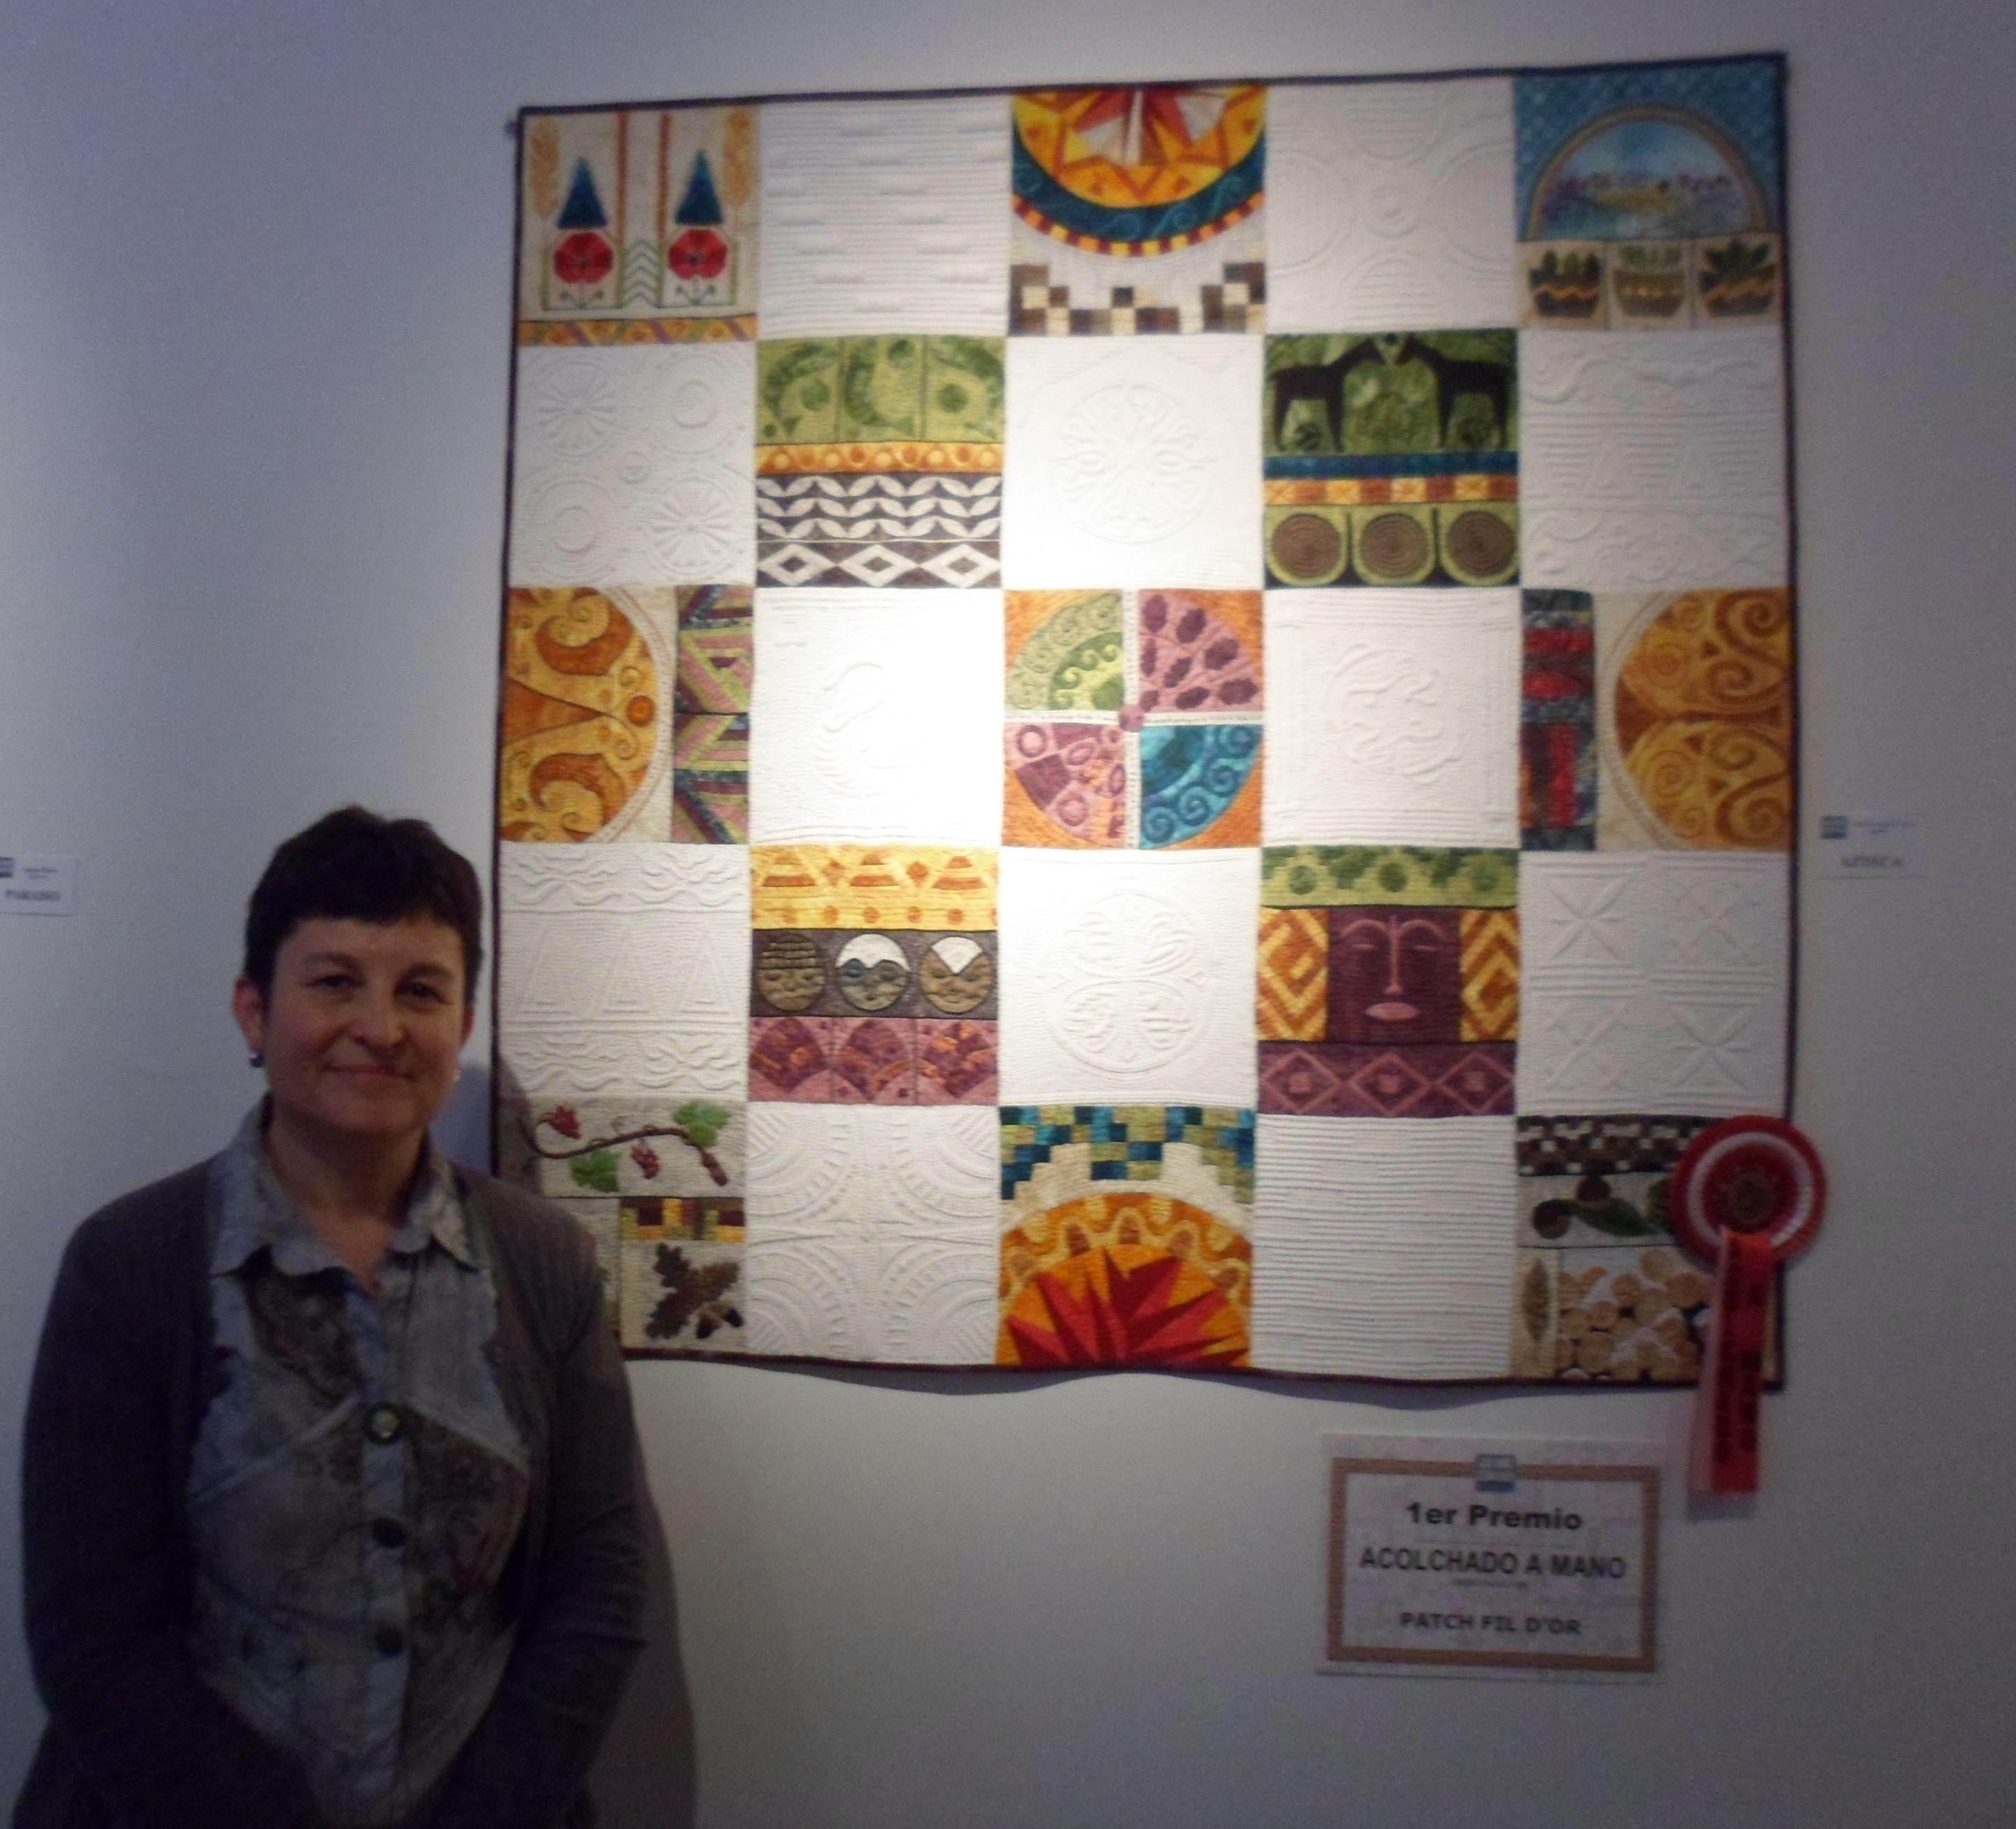 1er premio acolchado a mano. Festival Sitges